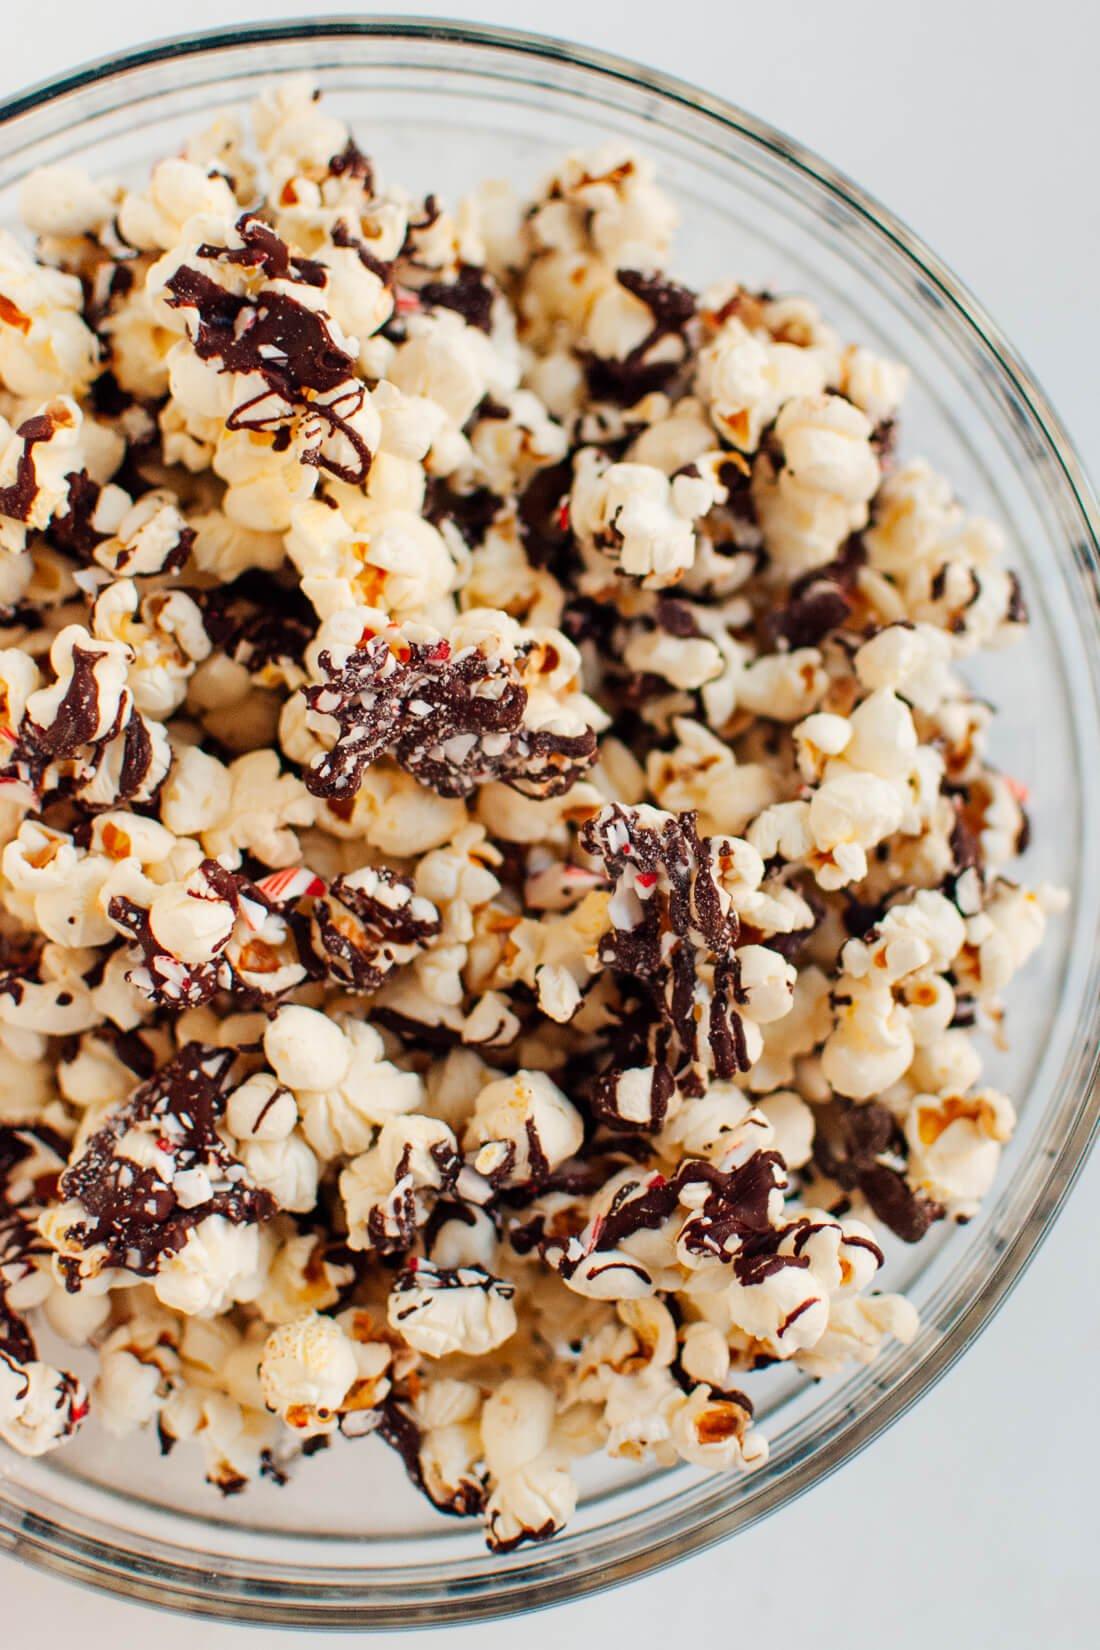 Peppermint chocolate popcorn recipe